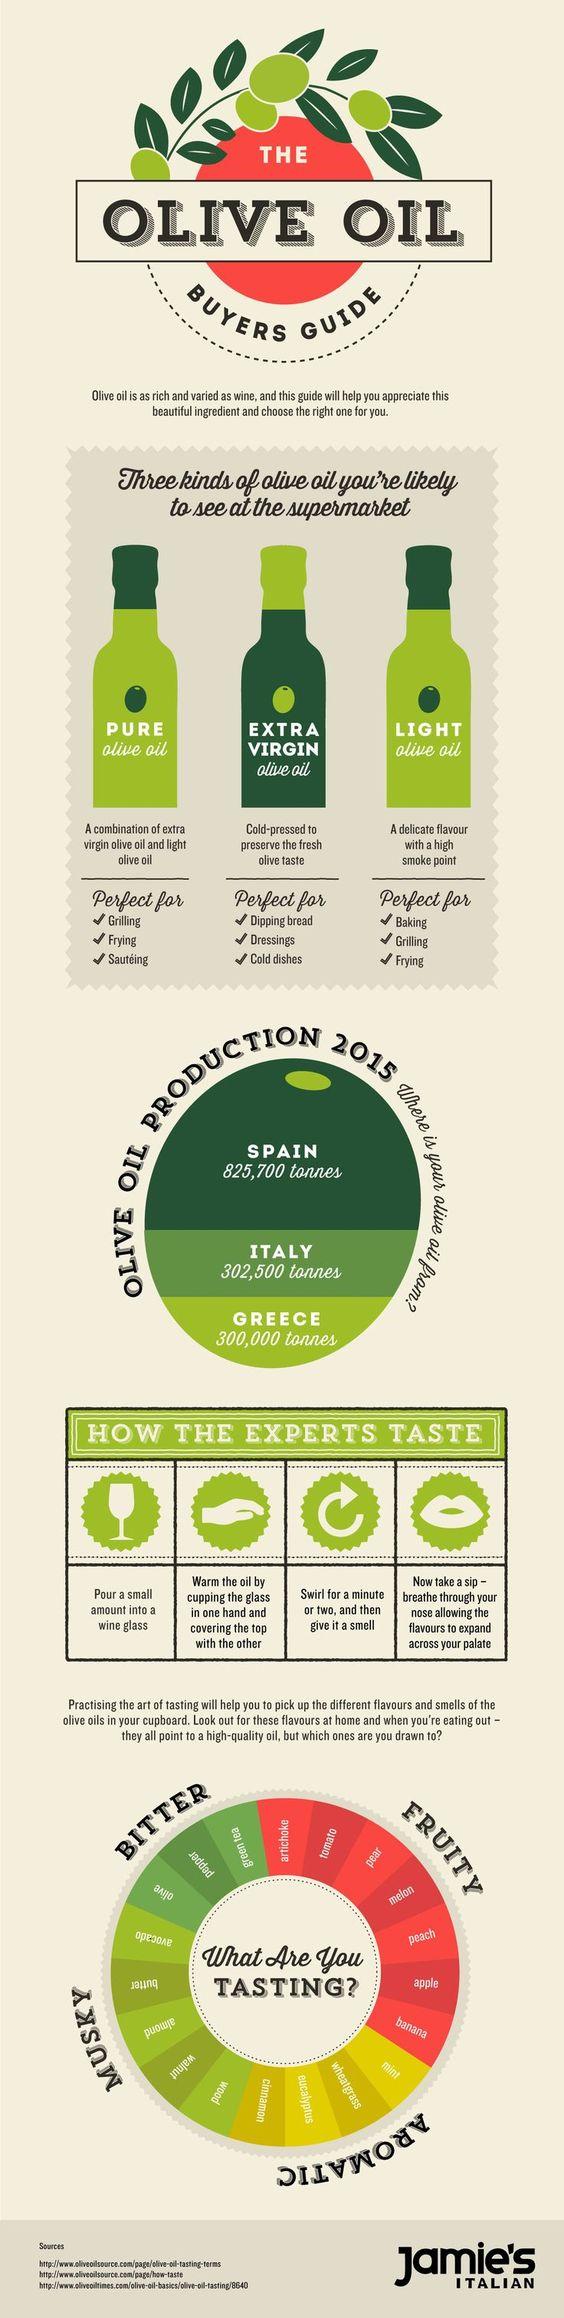 Tasting-EVOO-Retail-Infographic.jpg